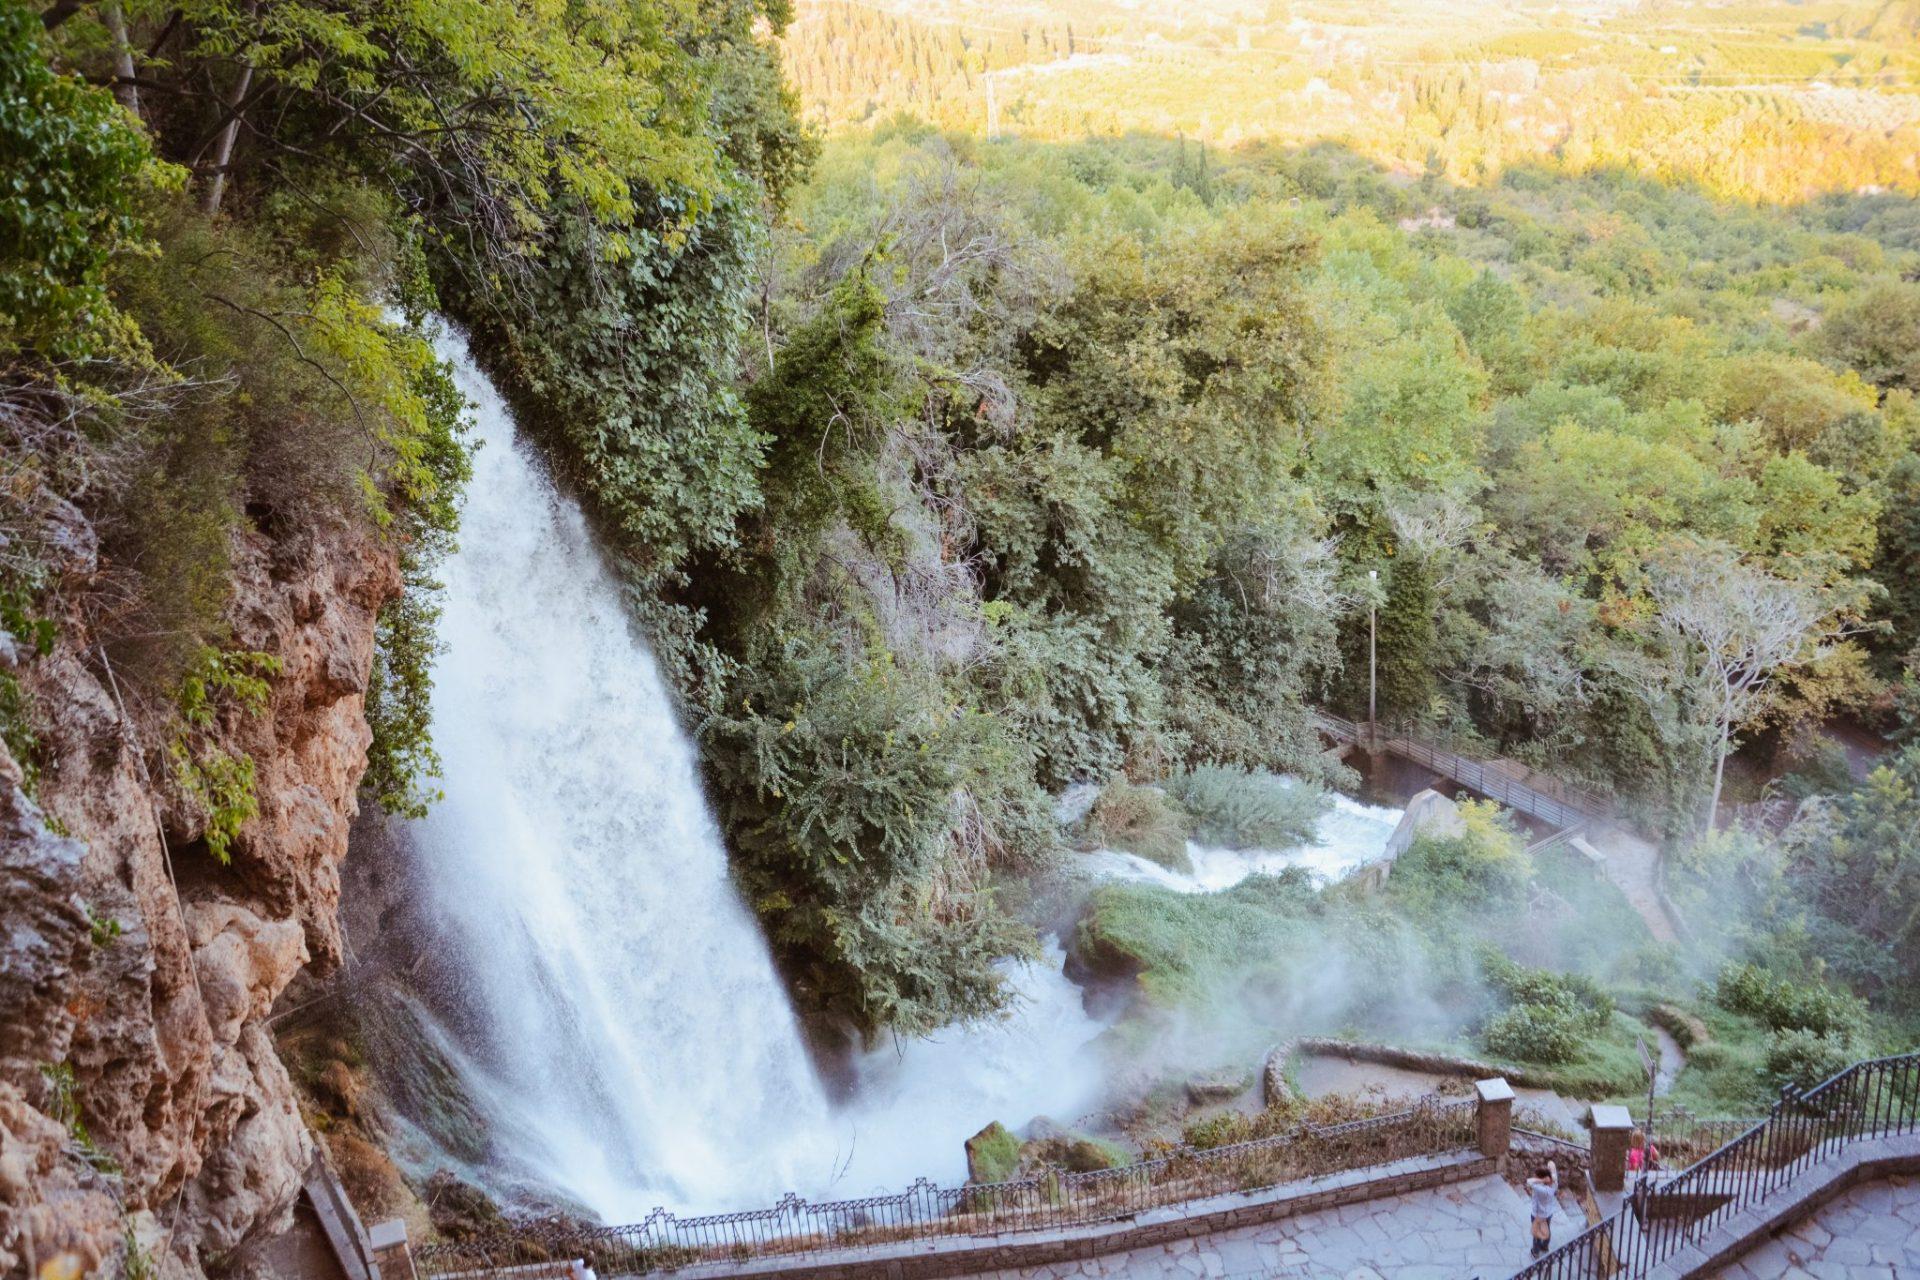 Edessa waterfalls, Greece